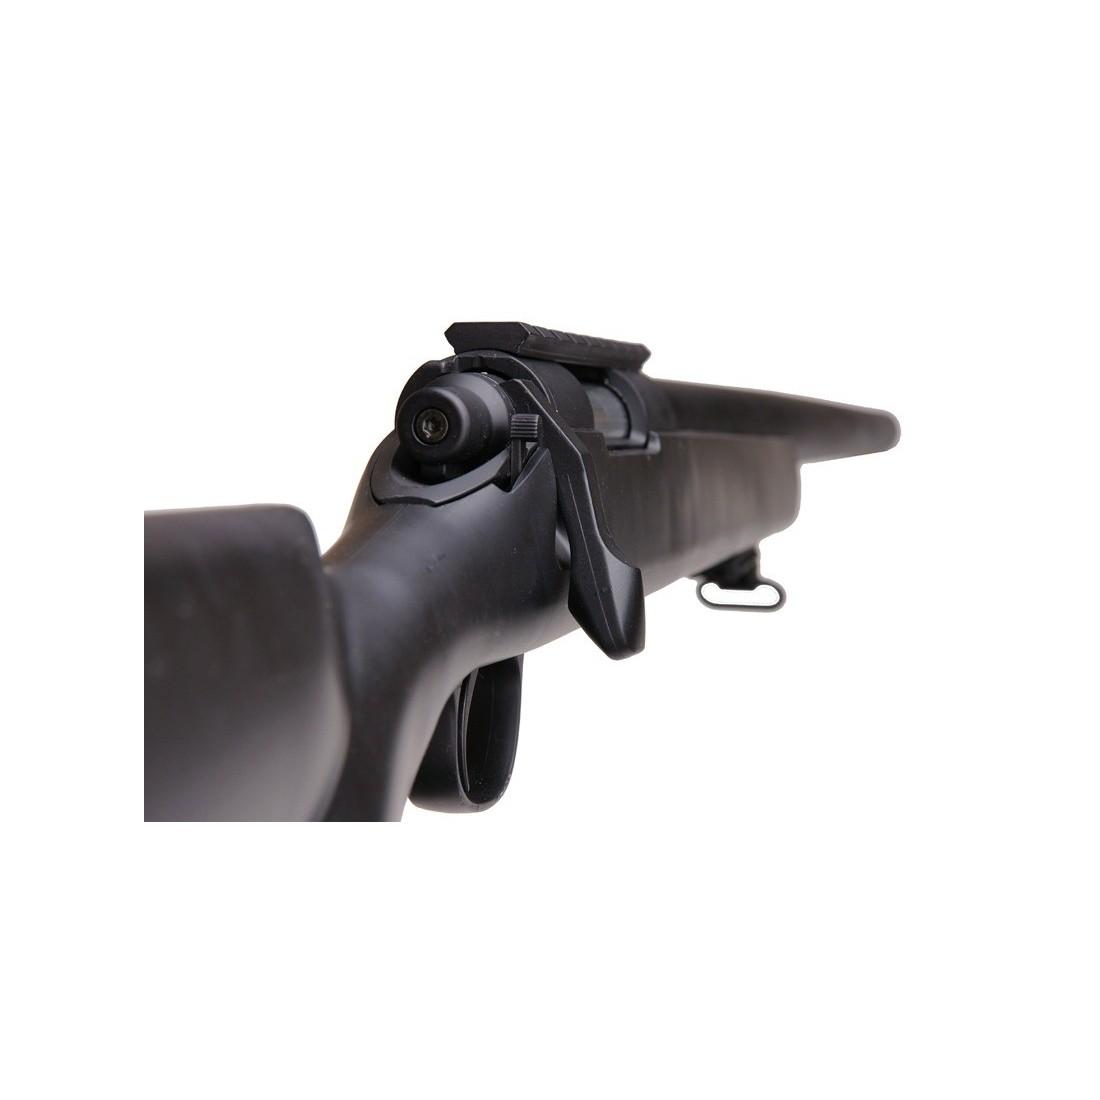 Sniper MB03A bk [Well]